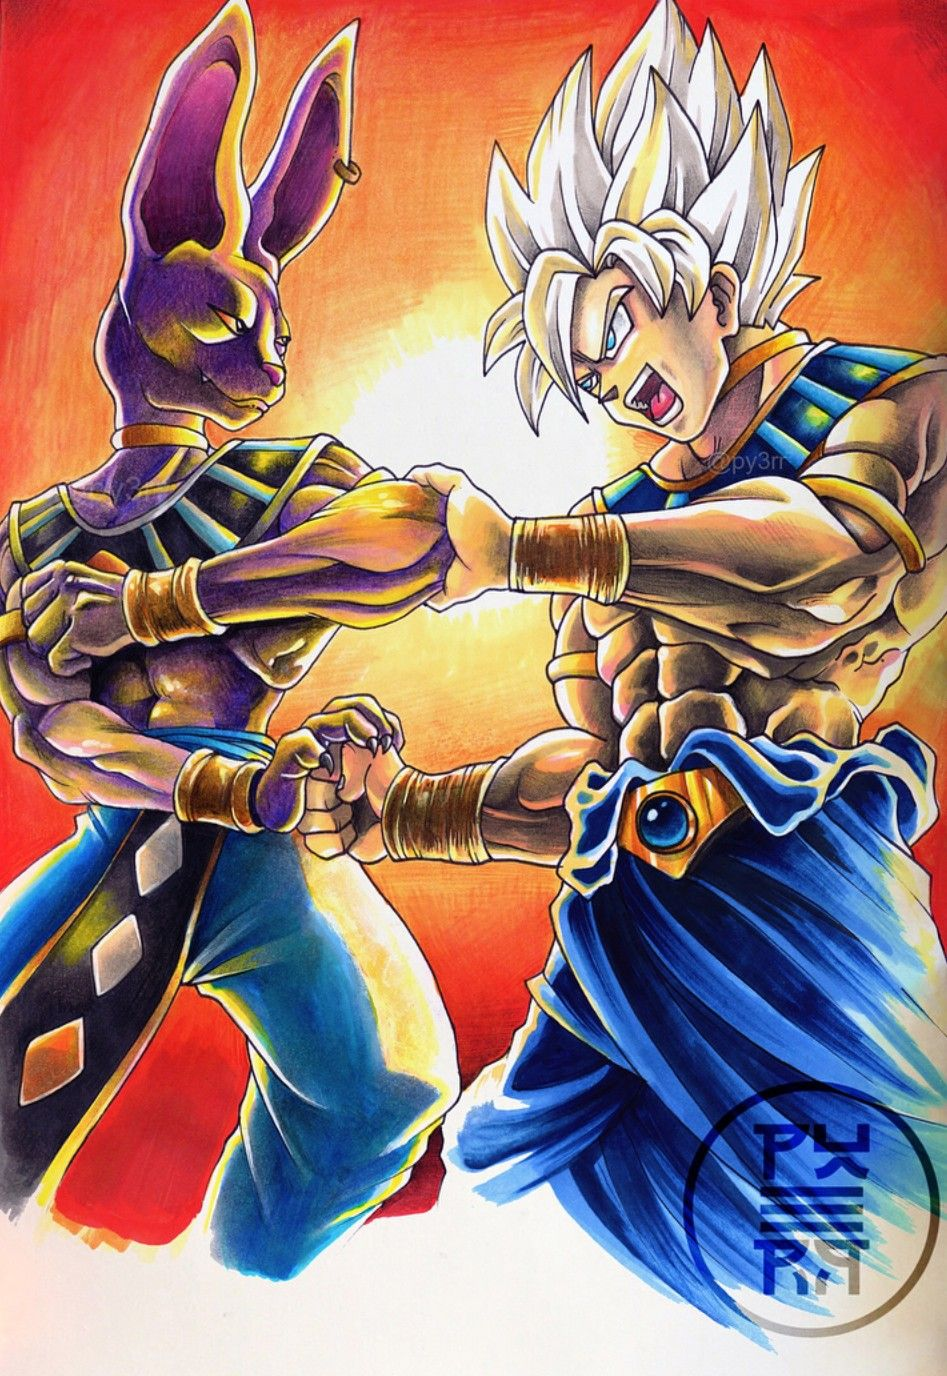 Beerus Vs Goku Battle Of The Ancient Gods Dragon Ball Super